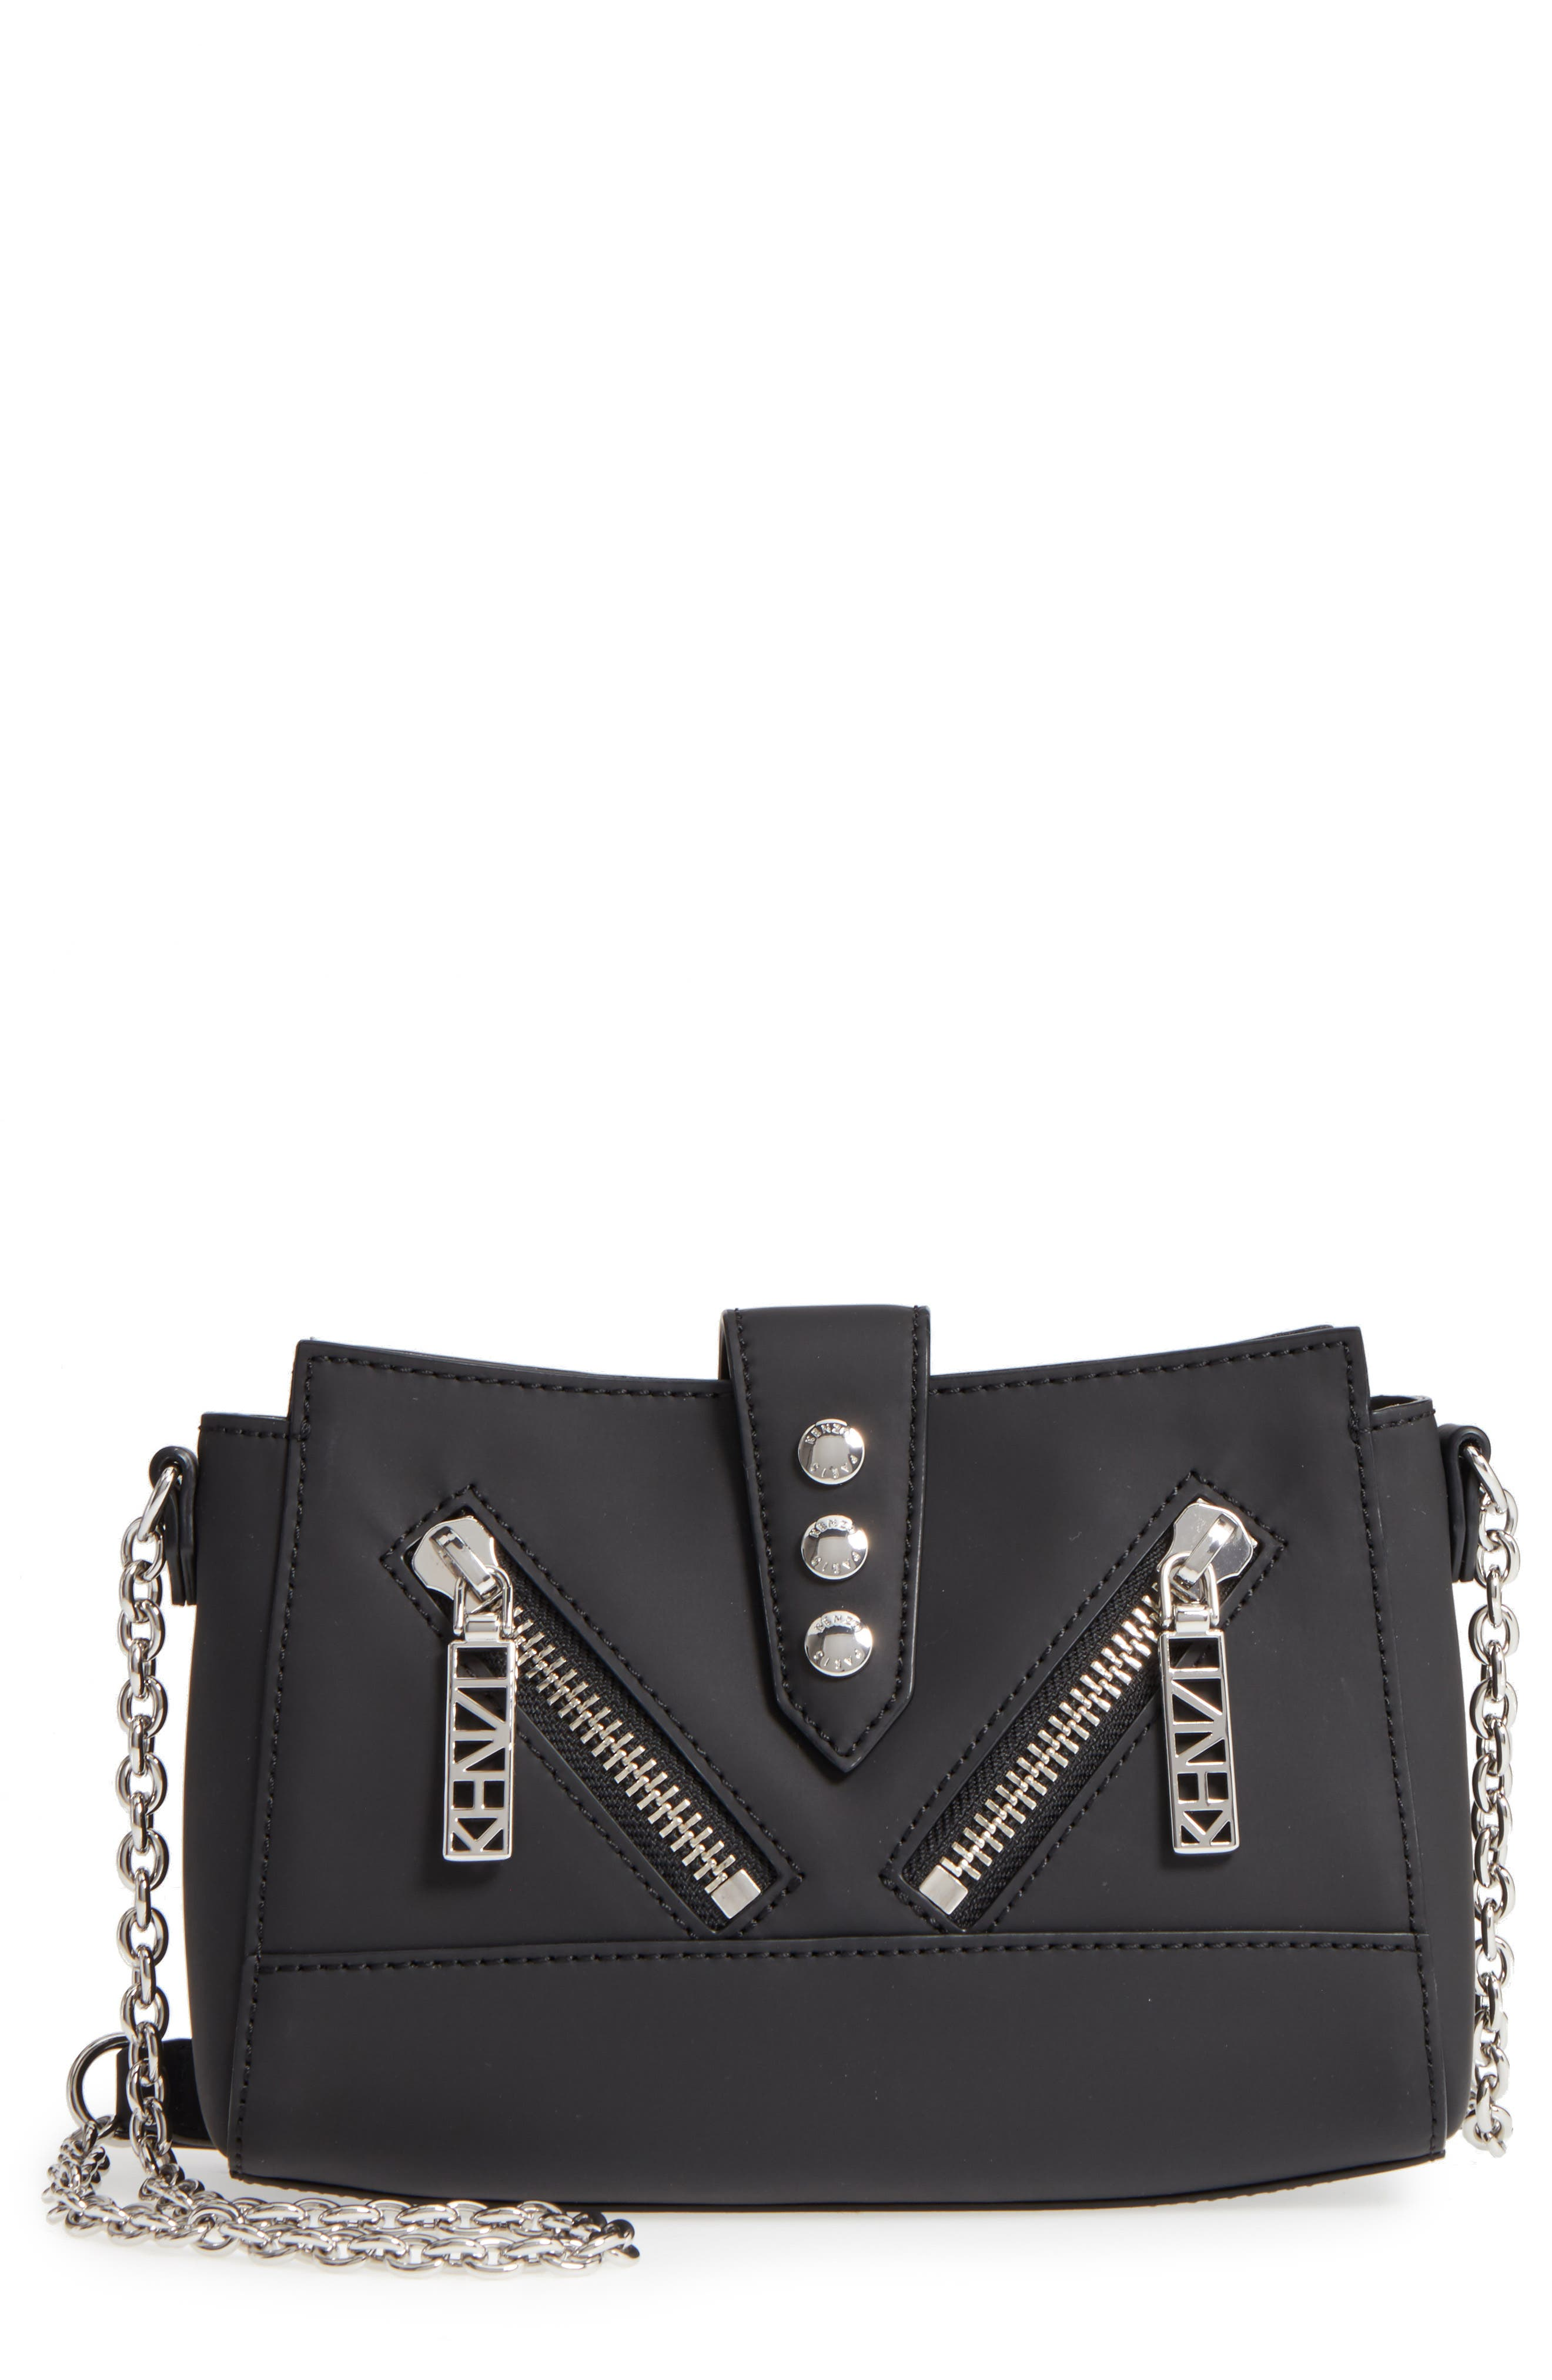 Alternate Image 1 Selected - KENZO Mini Kalifornia Grommato Leather Shoulder Bag